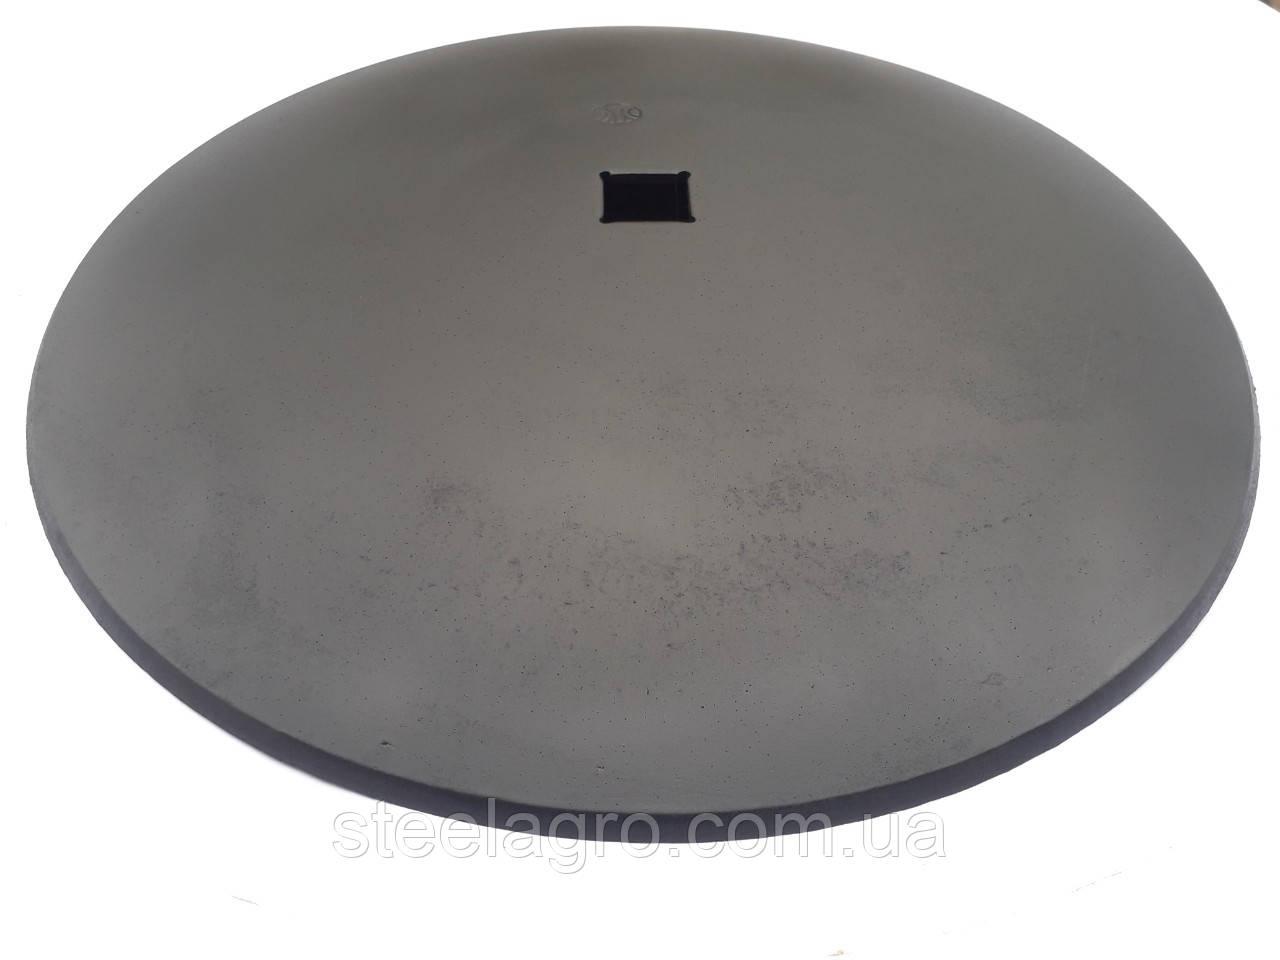 Диск борони 560х7мм, кв 40,5 мм гладкий/ромашка ст30Mnb5 до борони Уманьферммаш БДШ-8.2